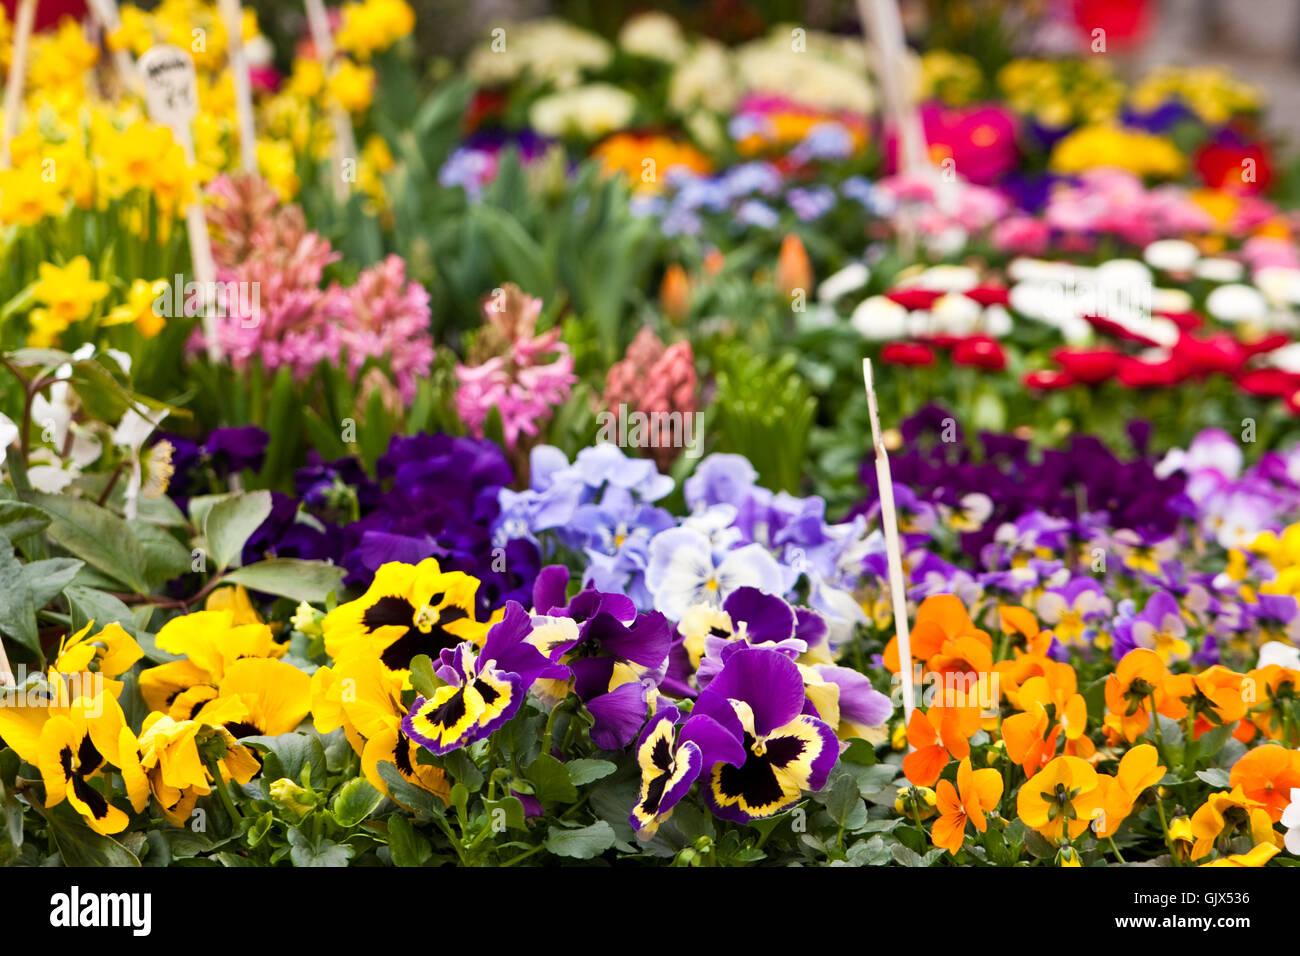 flower plant bloom - Stock Image